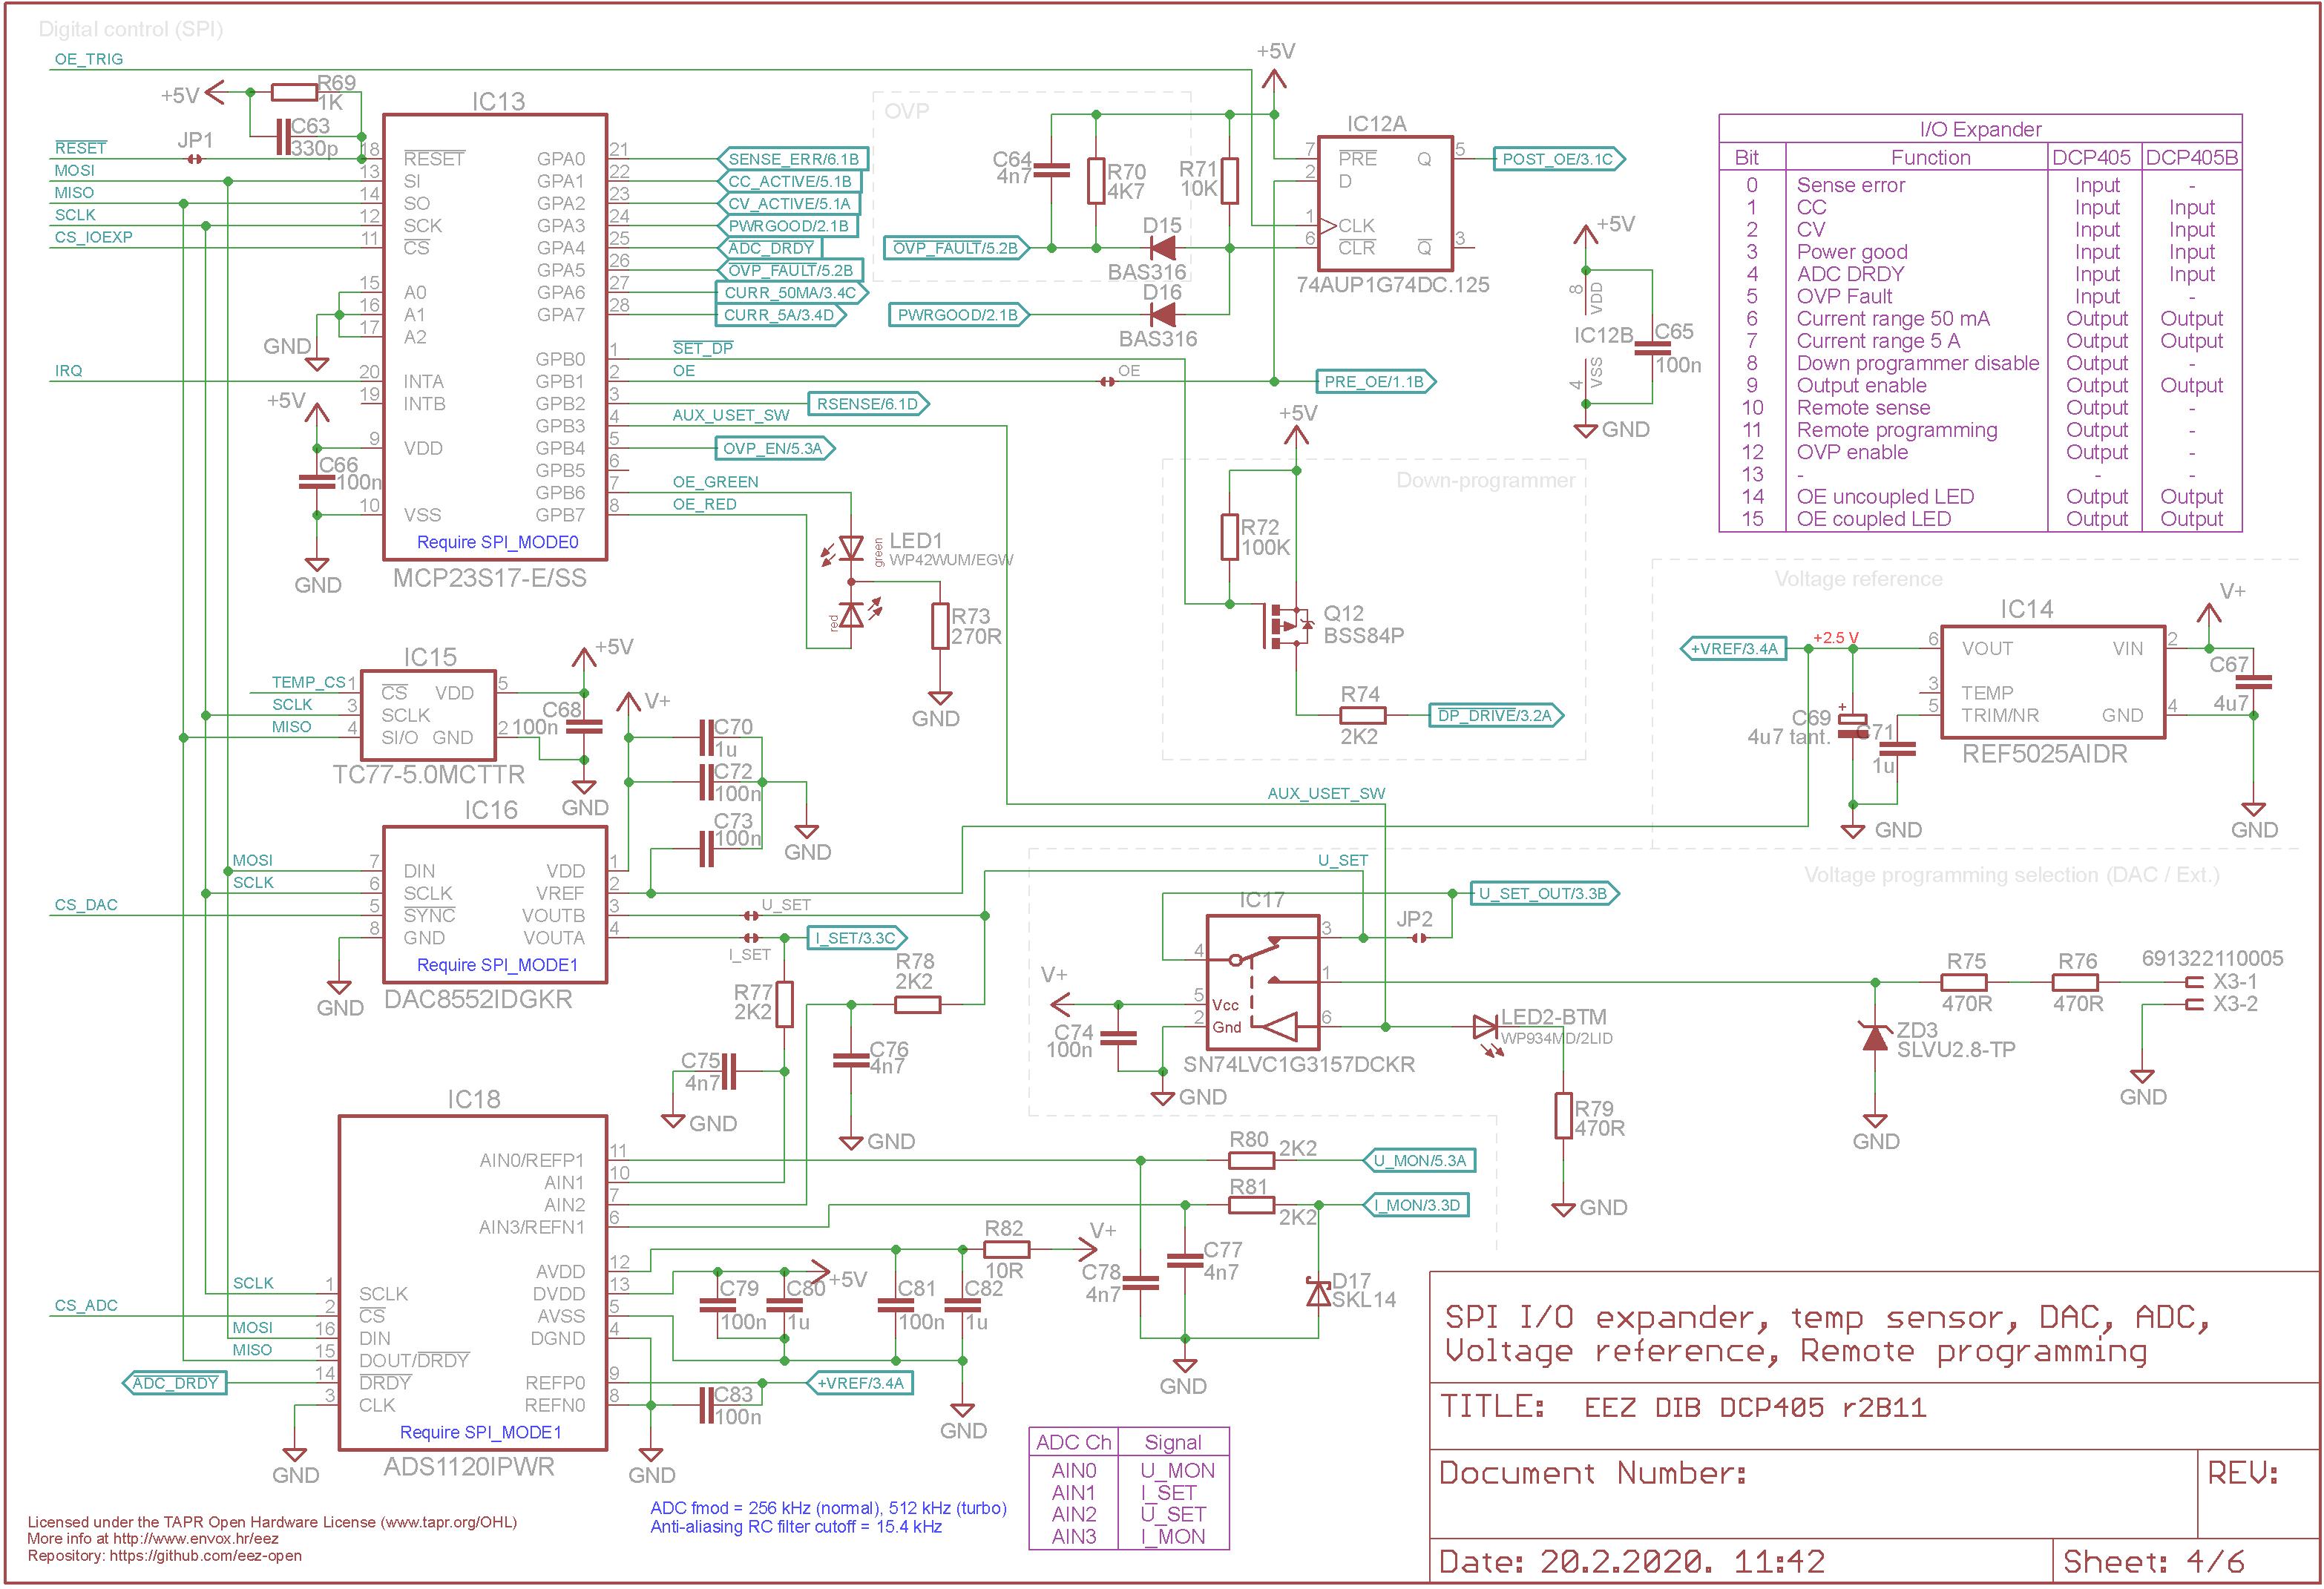 eez_dcp405_r2b11_sheet4of6.png